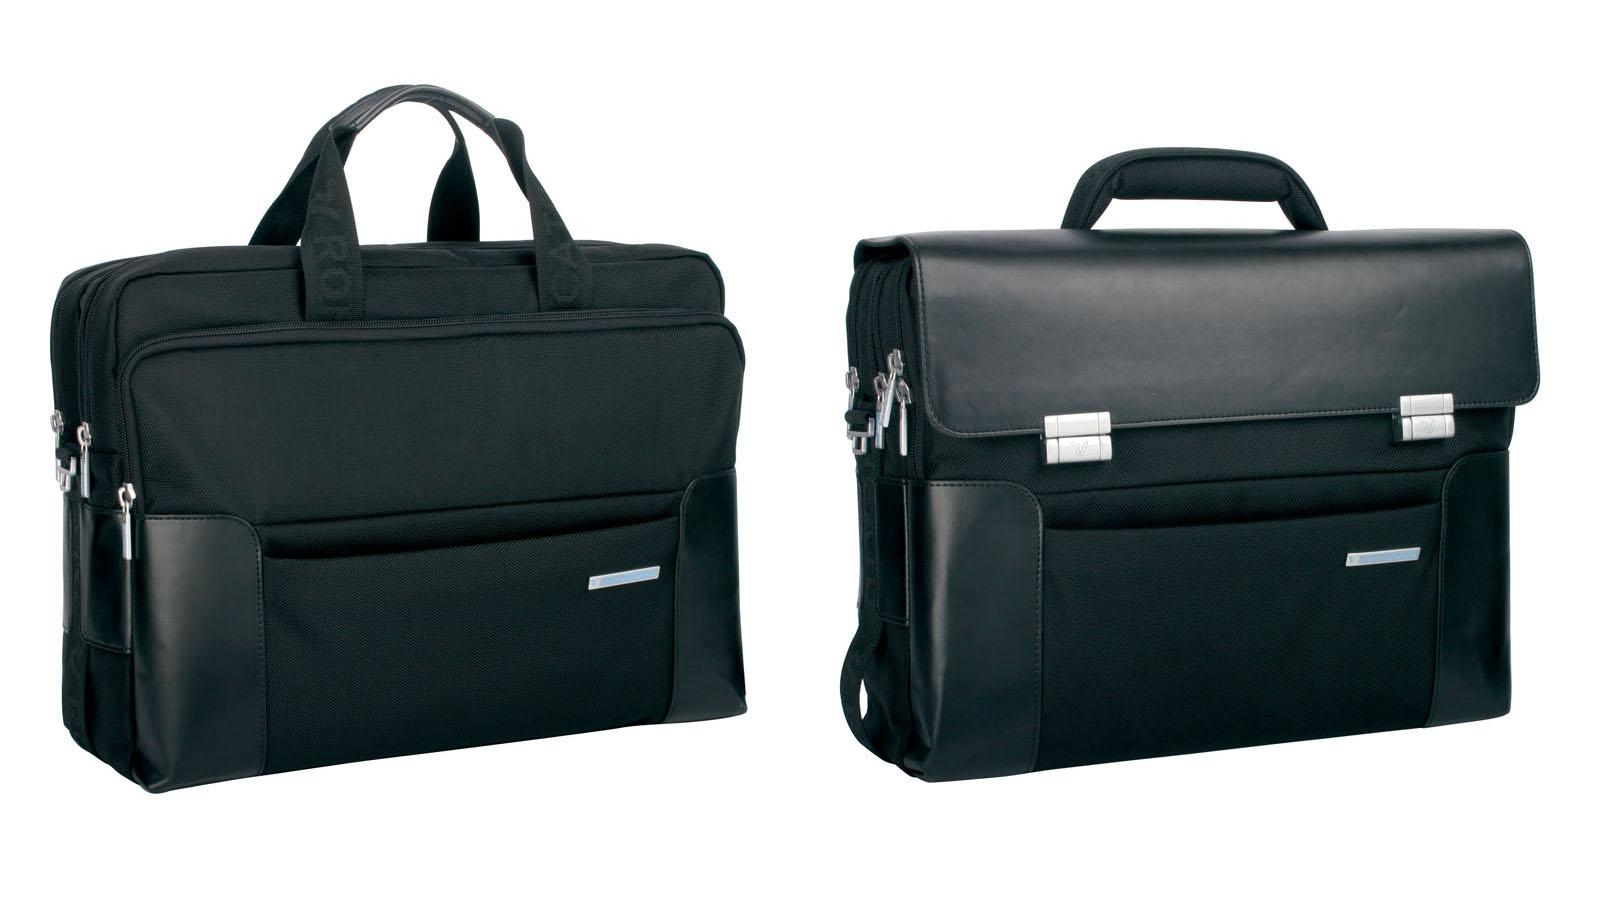 laptop-bag-collection-xelle-altri-modelli